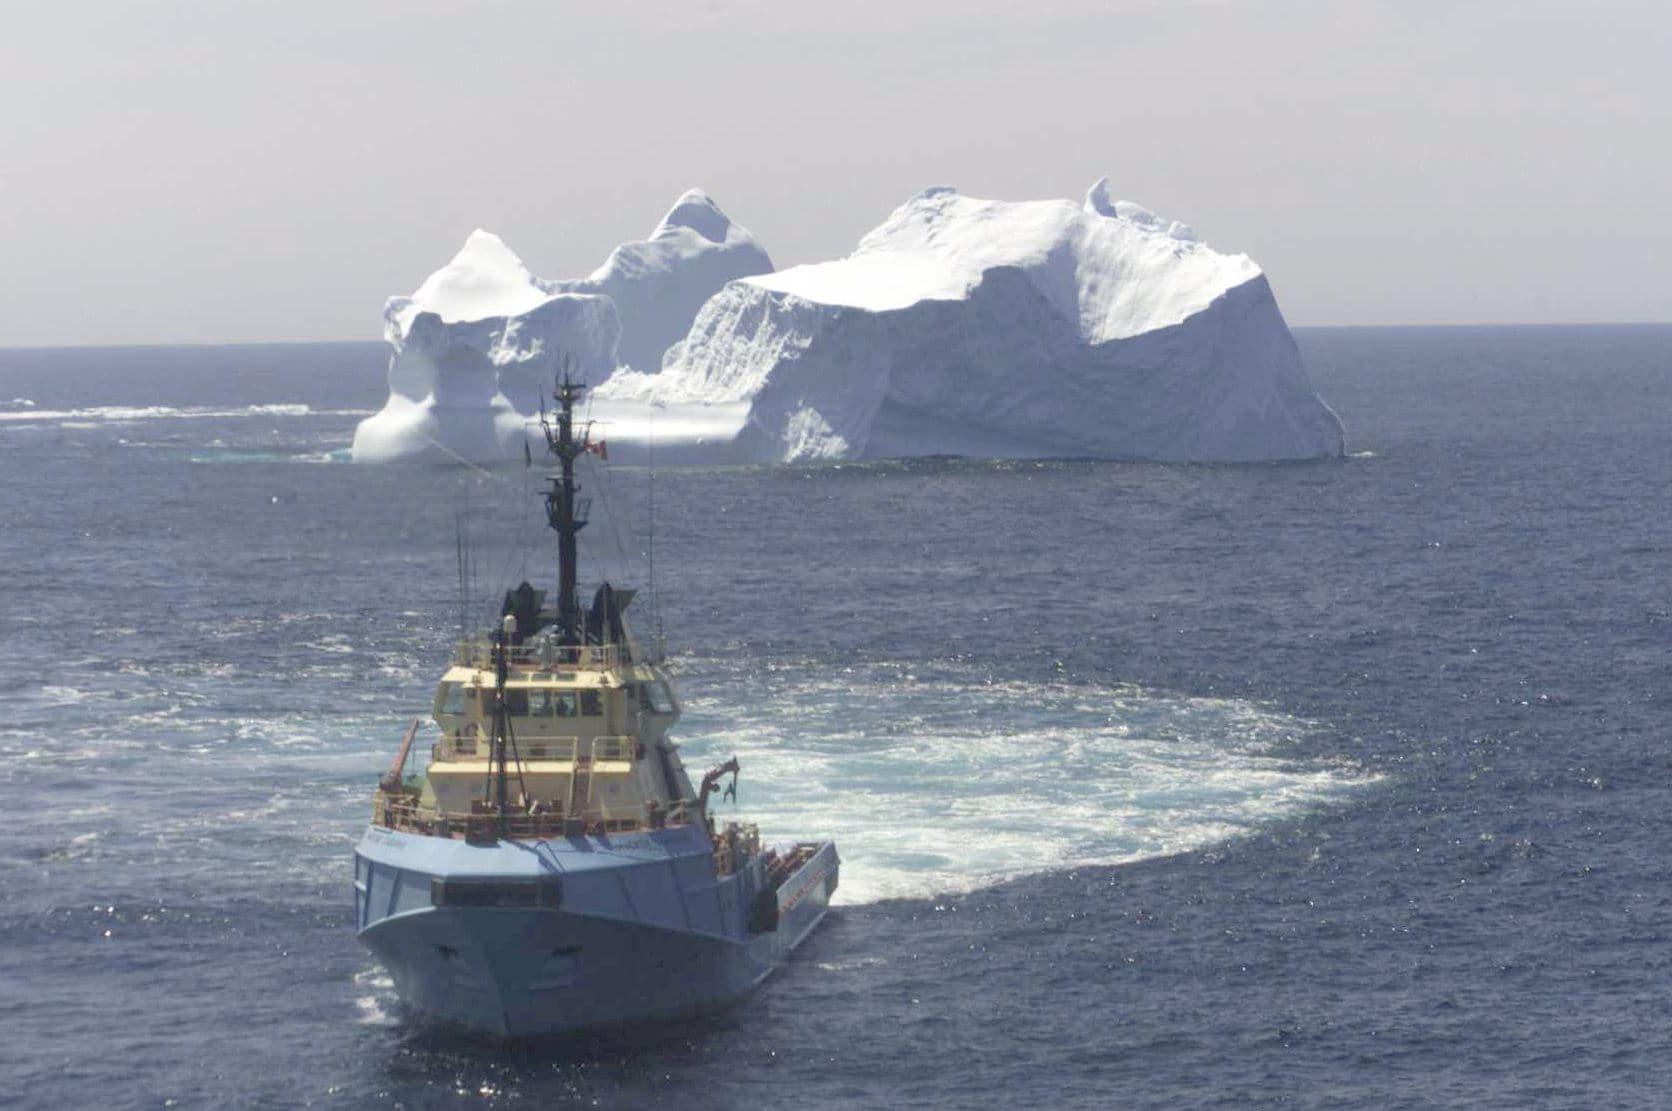 Suncor iceburg management